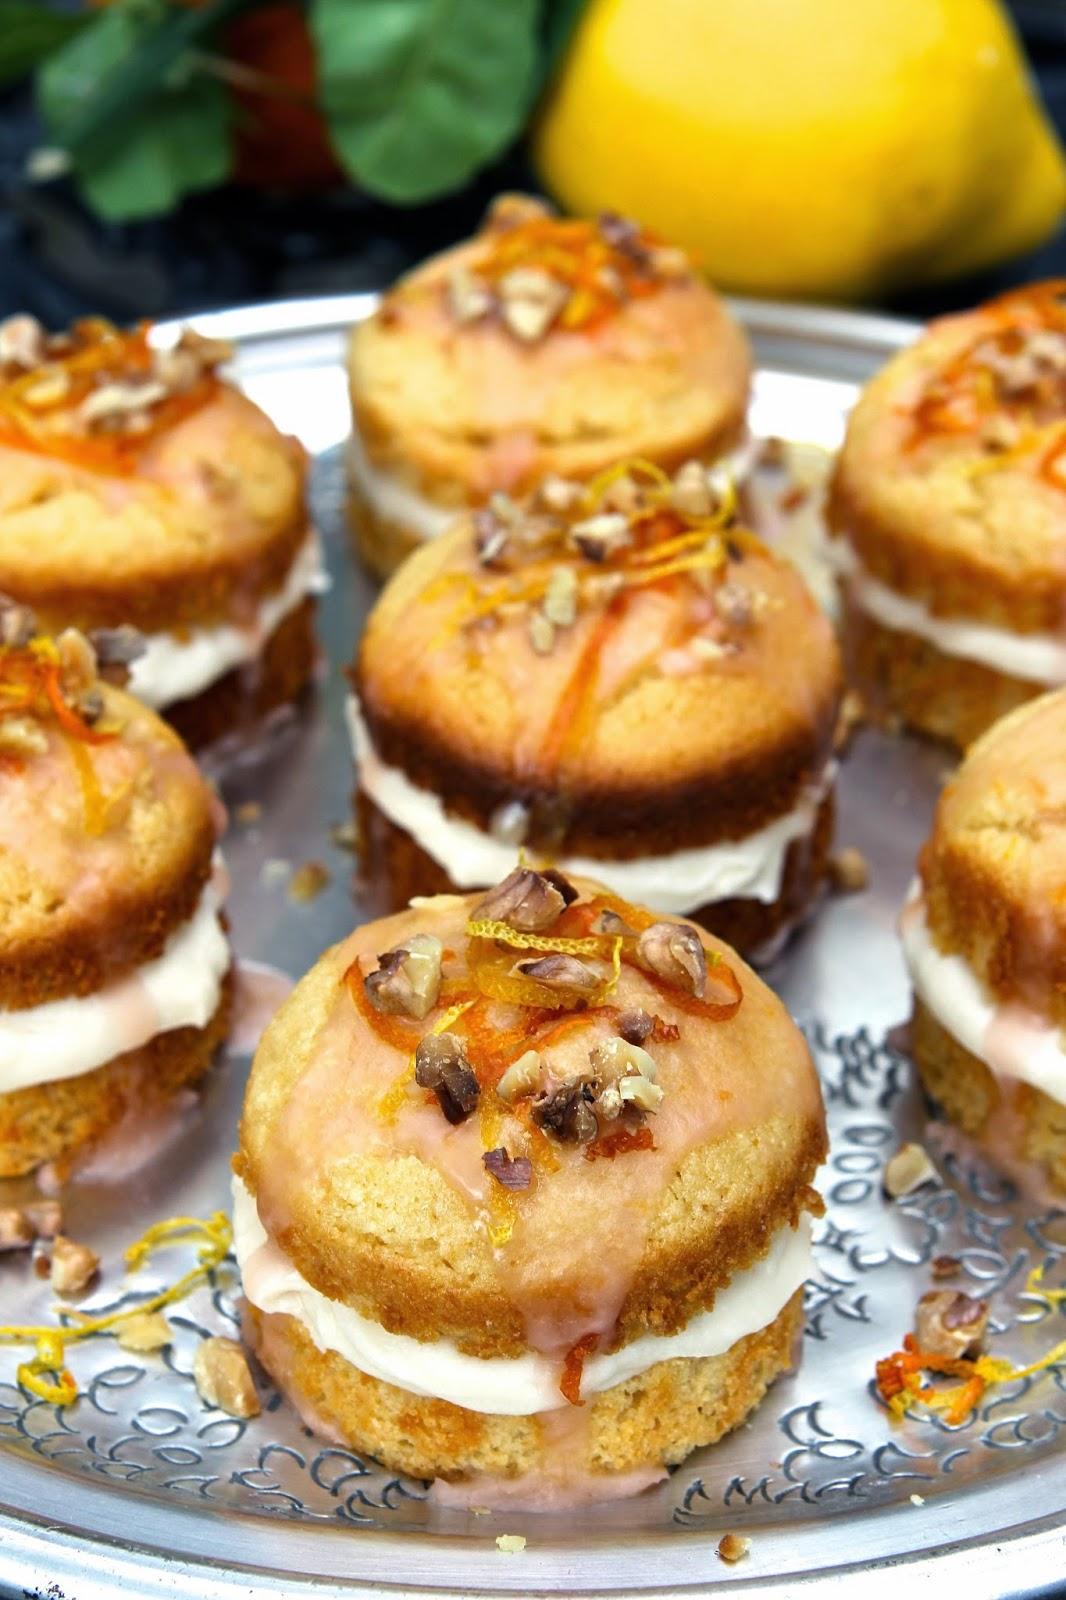 Fatless Sponge Cake Recipe